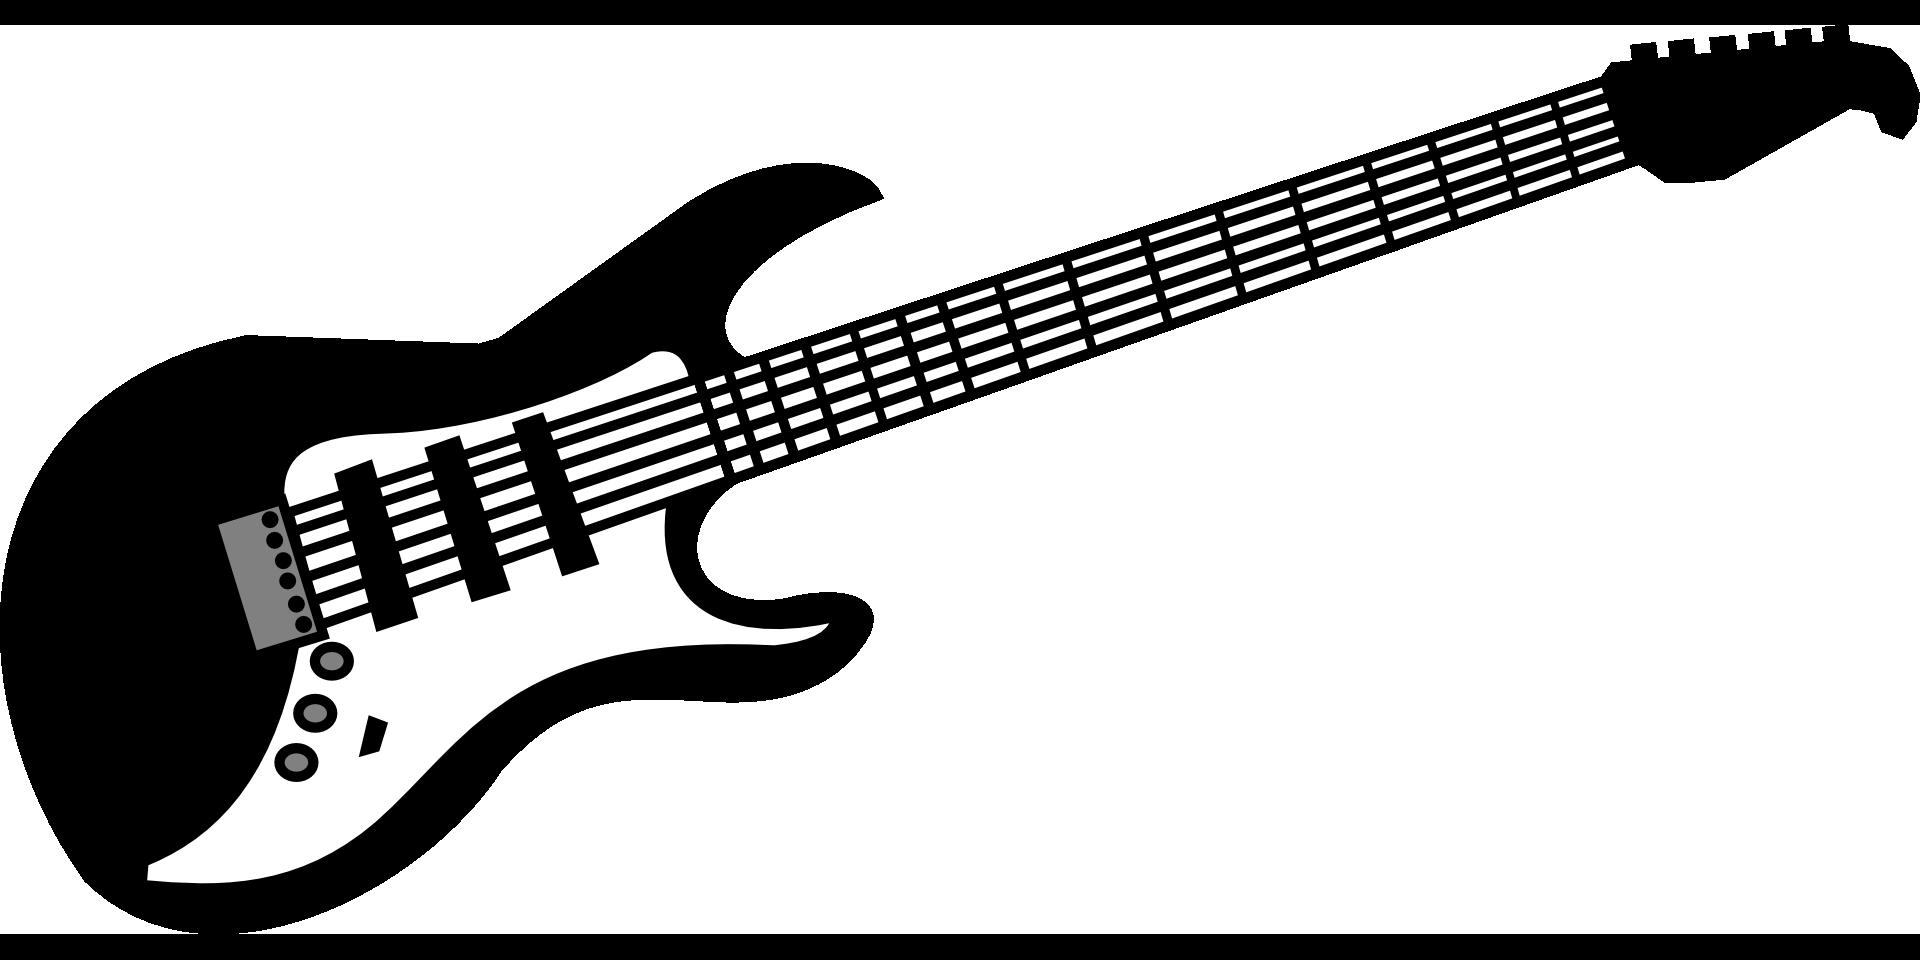 Guitar Electric Music Rock Instrument Black White Drawing